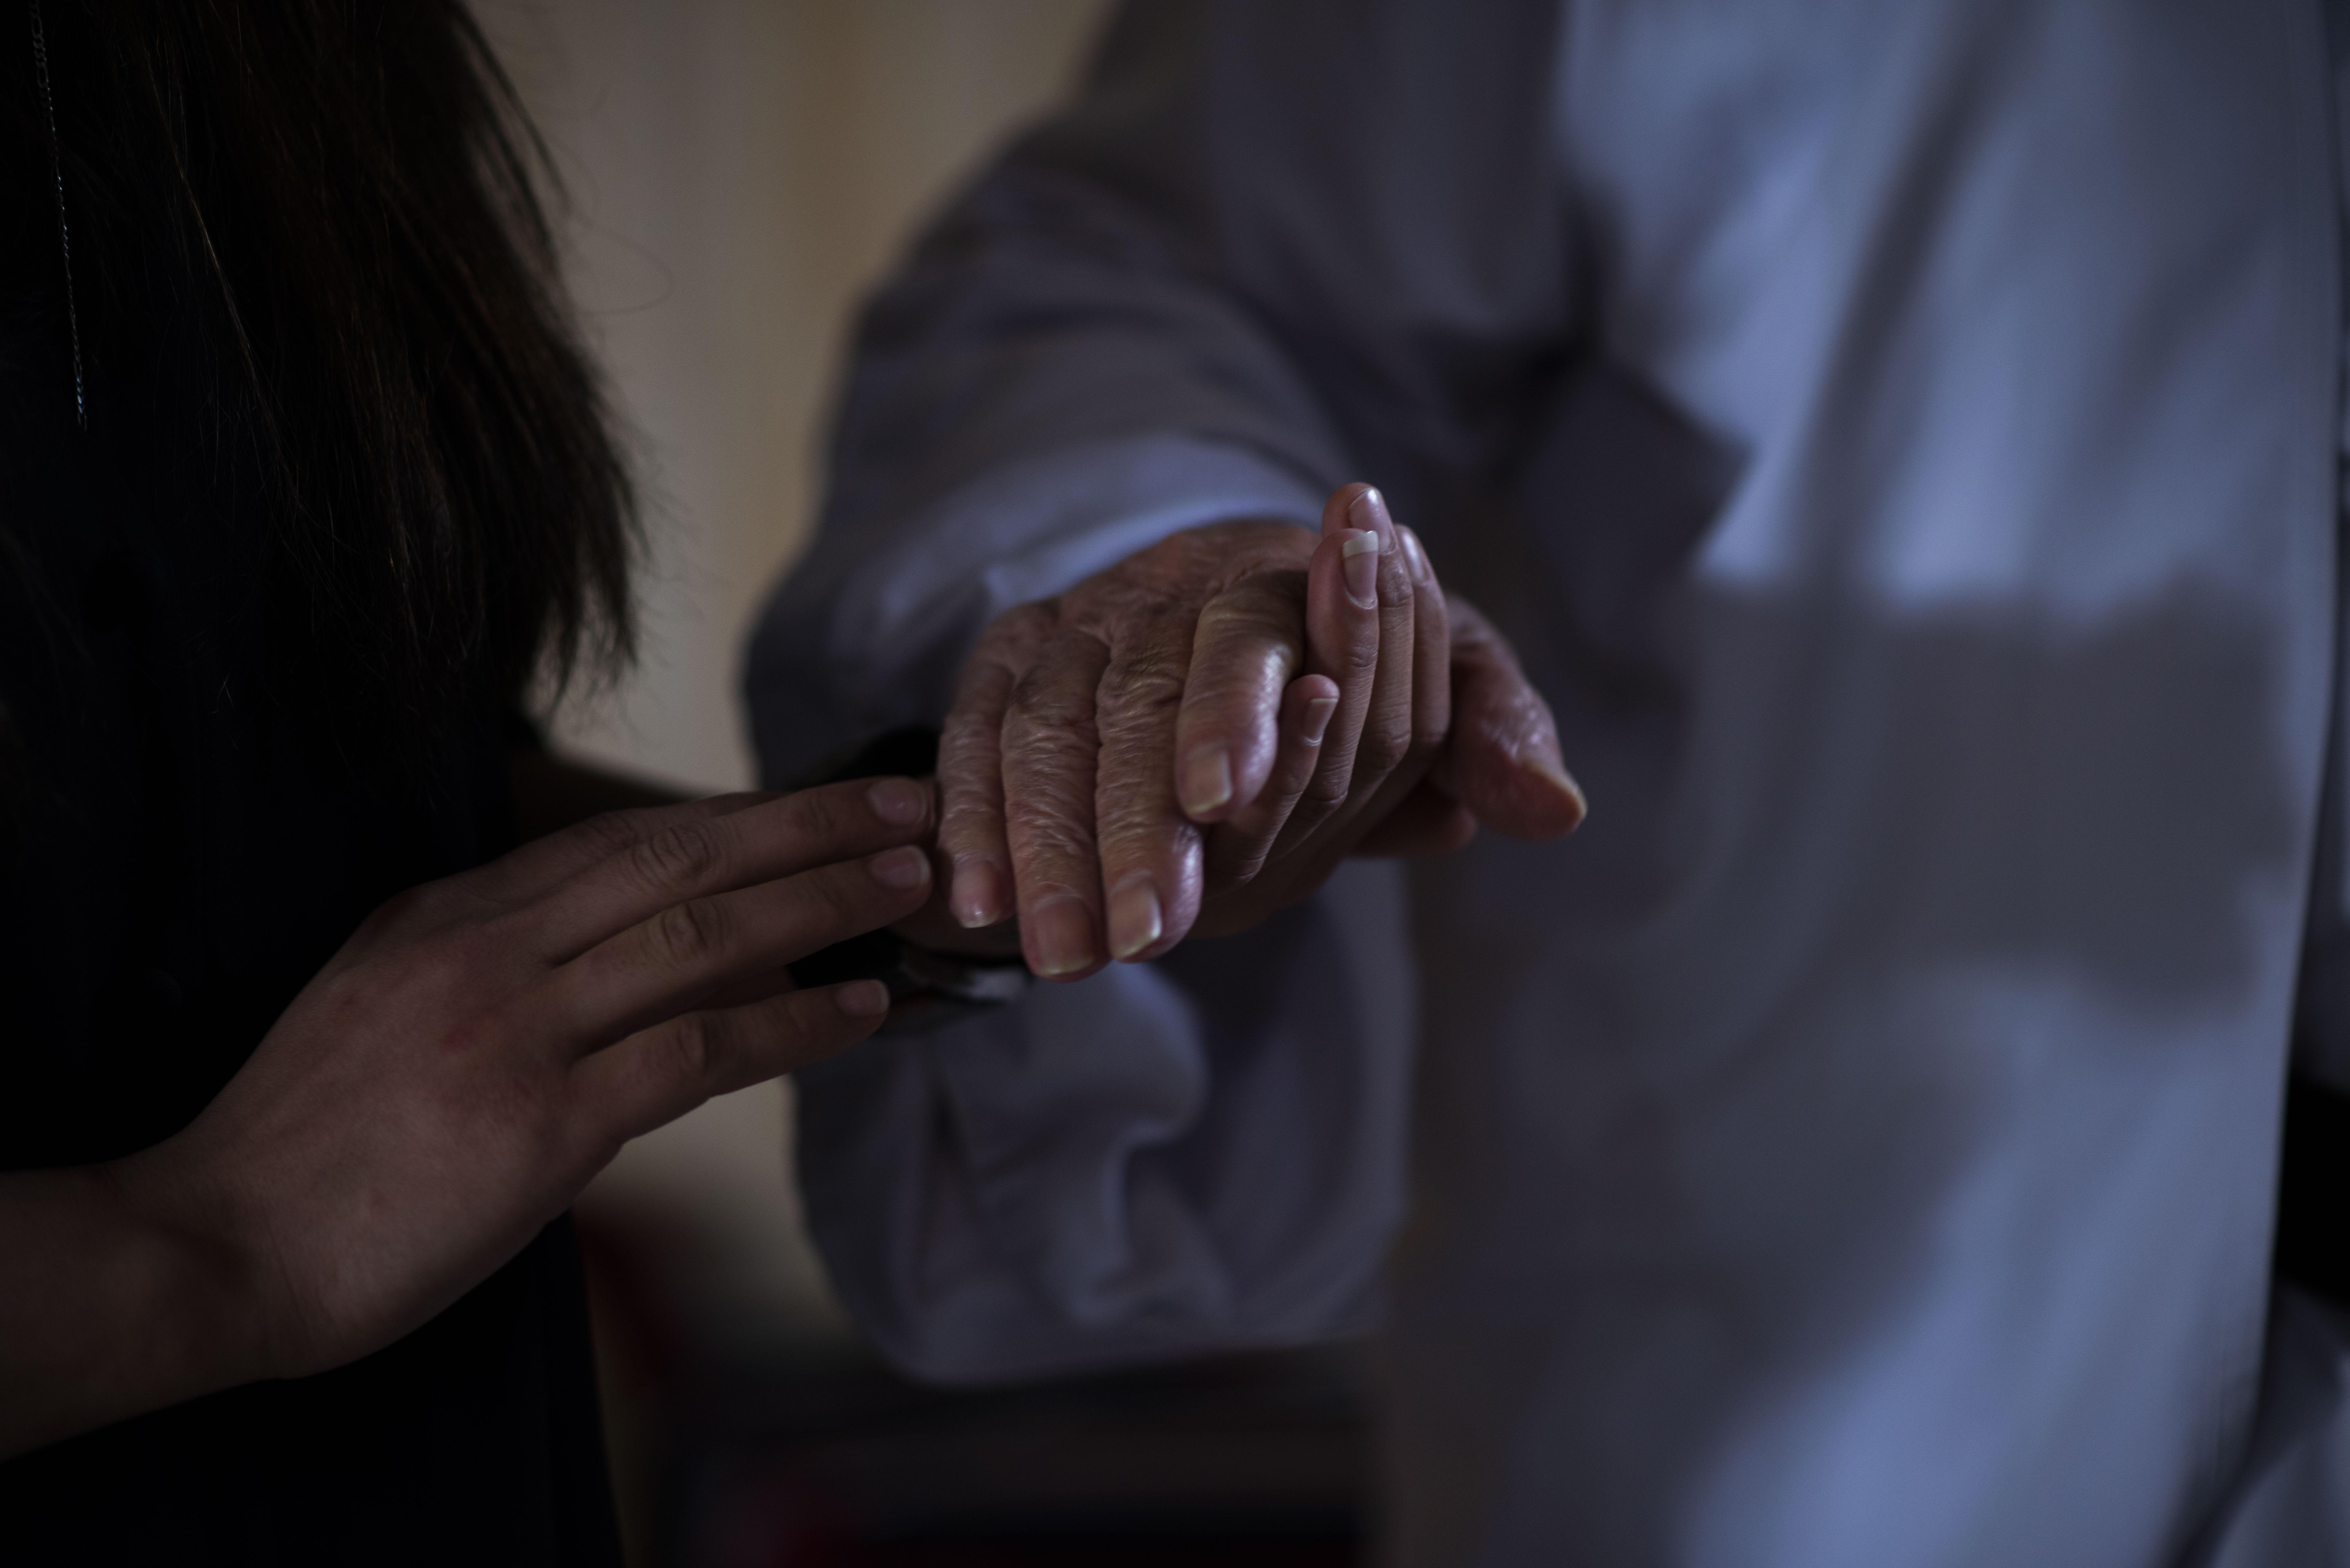 A Yazidi woman and ISIS survivor strokes the hand of Baba Sheik, the spiritual leader of the Yazidi